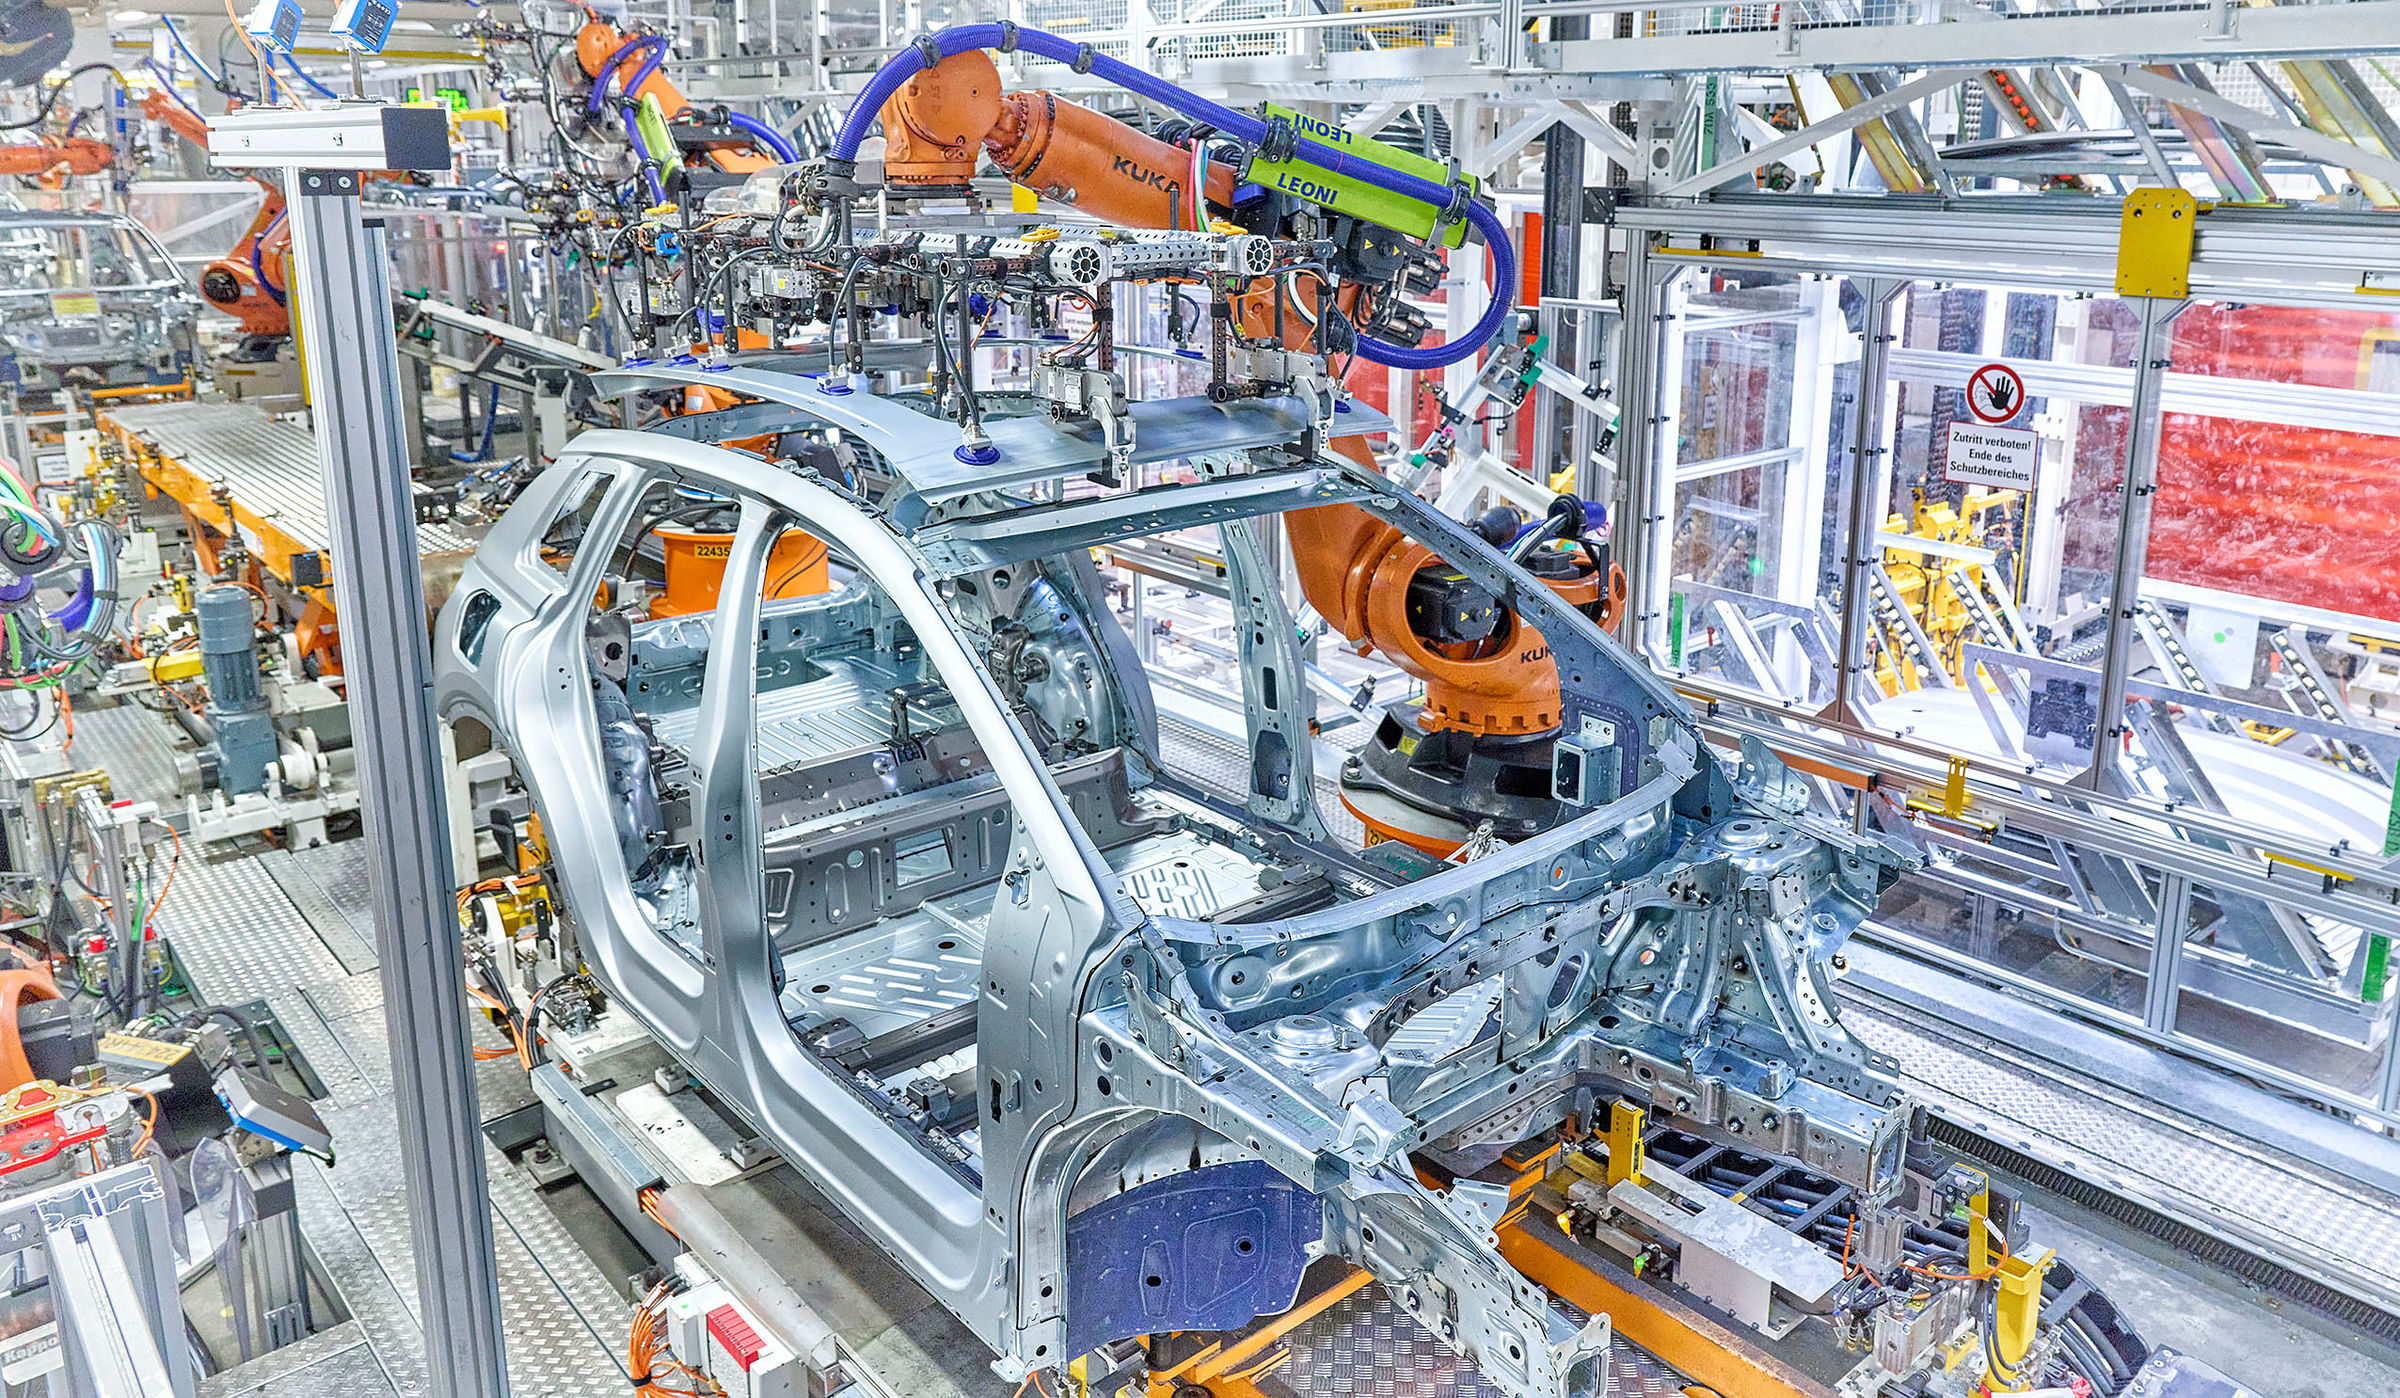 Start of production for Audi Q4 e-tron - Image 1